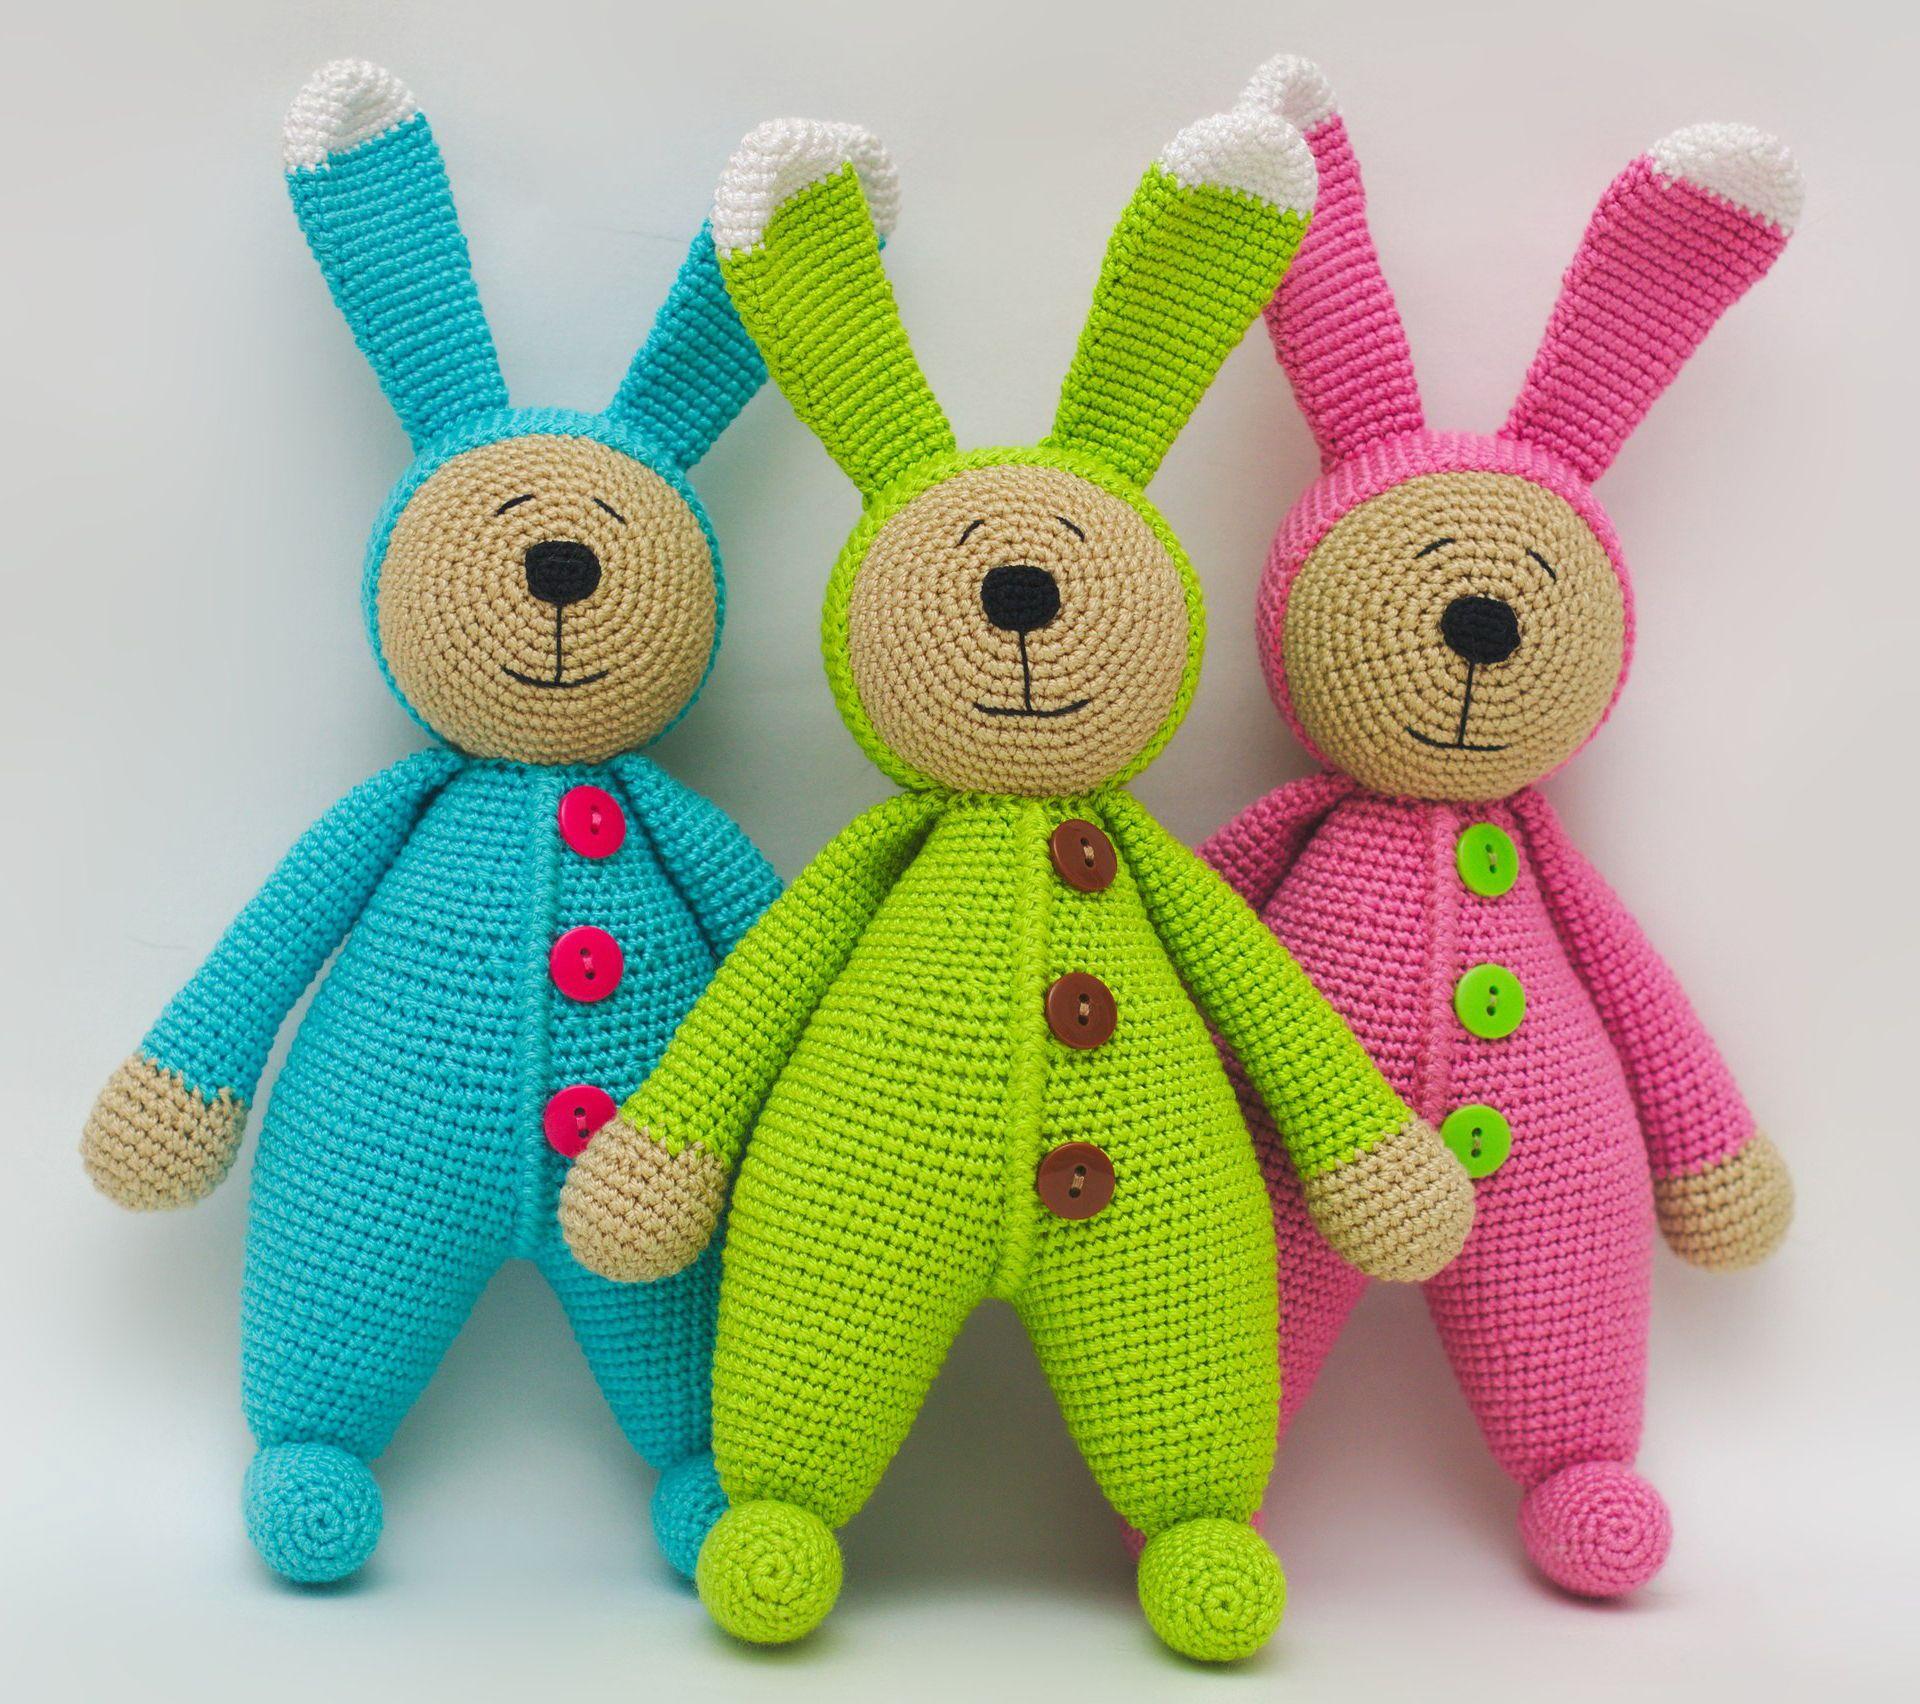 Crochet Bunny pattern #crochet #amigurumi #amigurumidoll #amigurumipattern  #amigurumitoy #amigurumiaddict … | Crochet bunny pattern, Crochet patterns  amigurumi, Crochet rabbit | 1704x1920